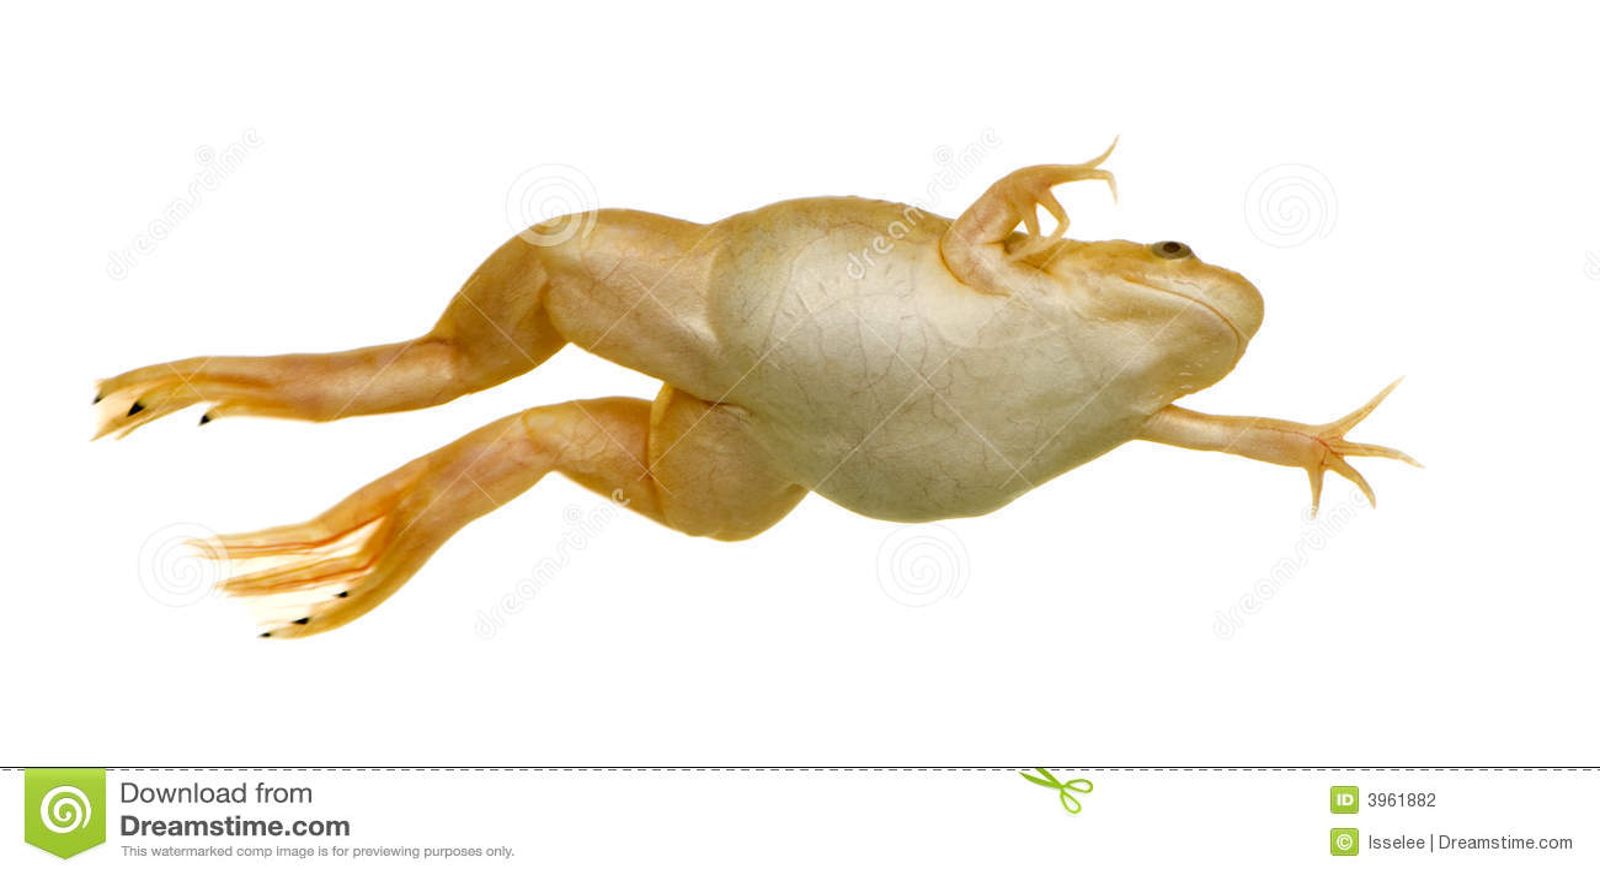 frog xenopus laevis 3961882